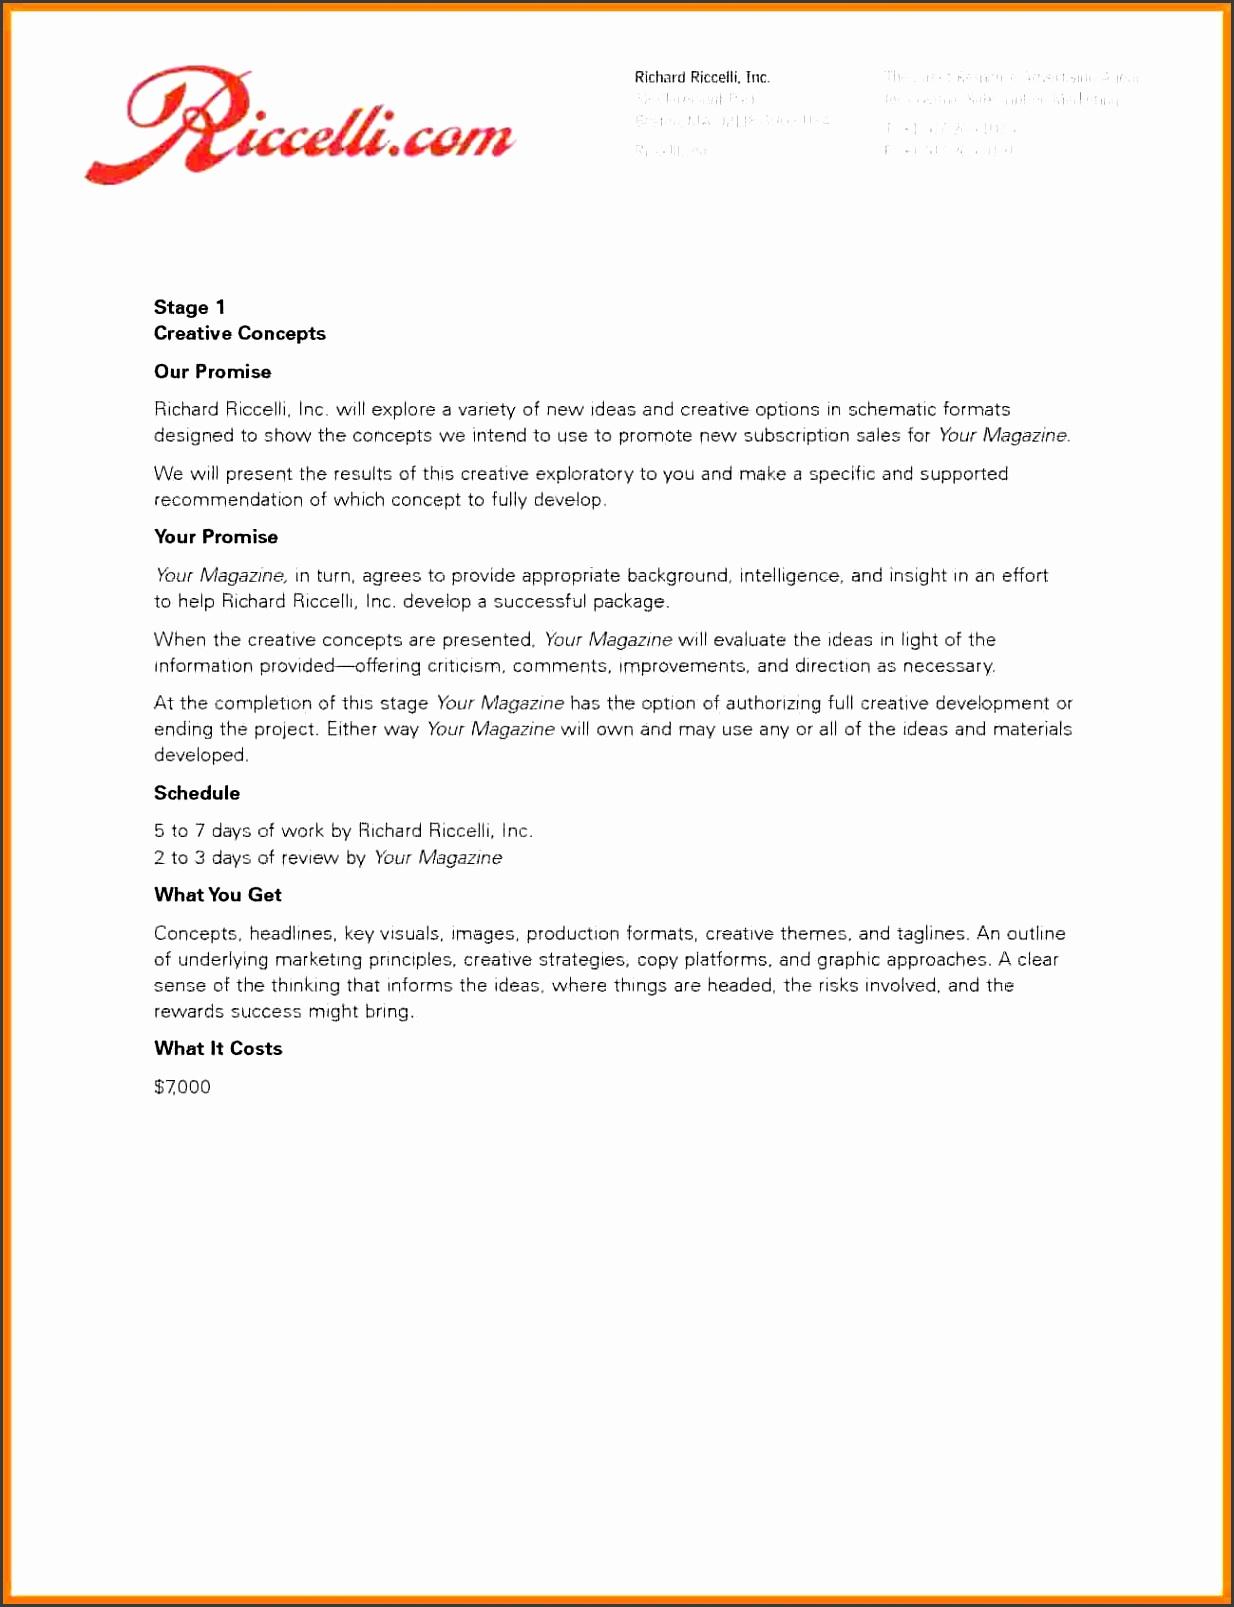 advertising proposal samplevertising proposal sample letter 71e914c696d bcef81acf3243